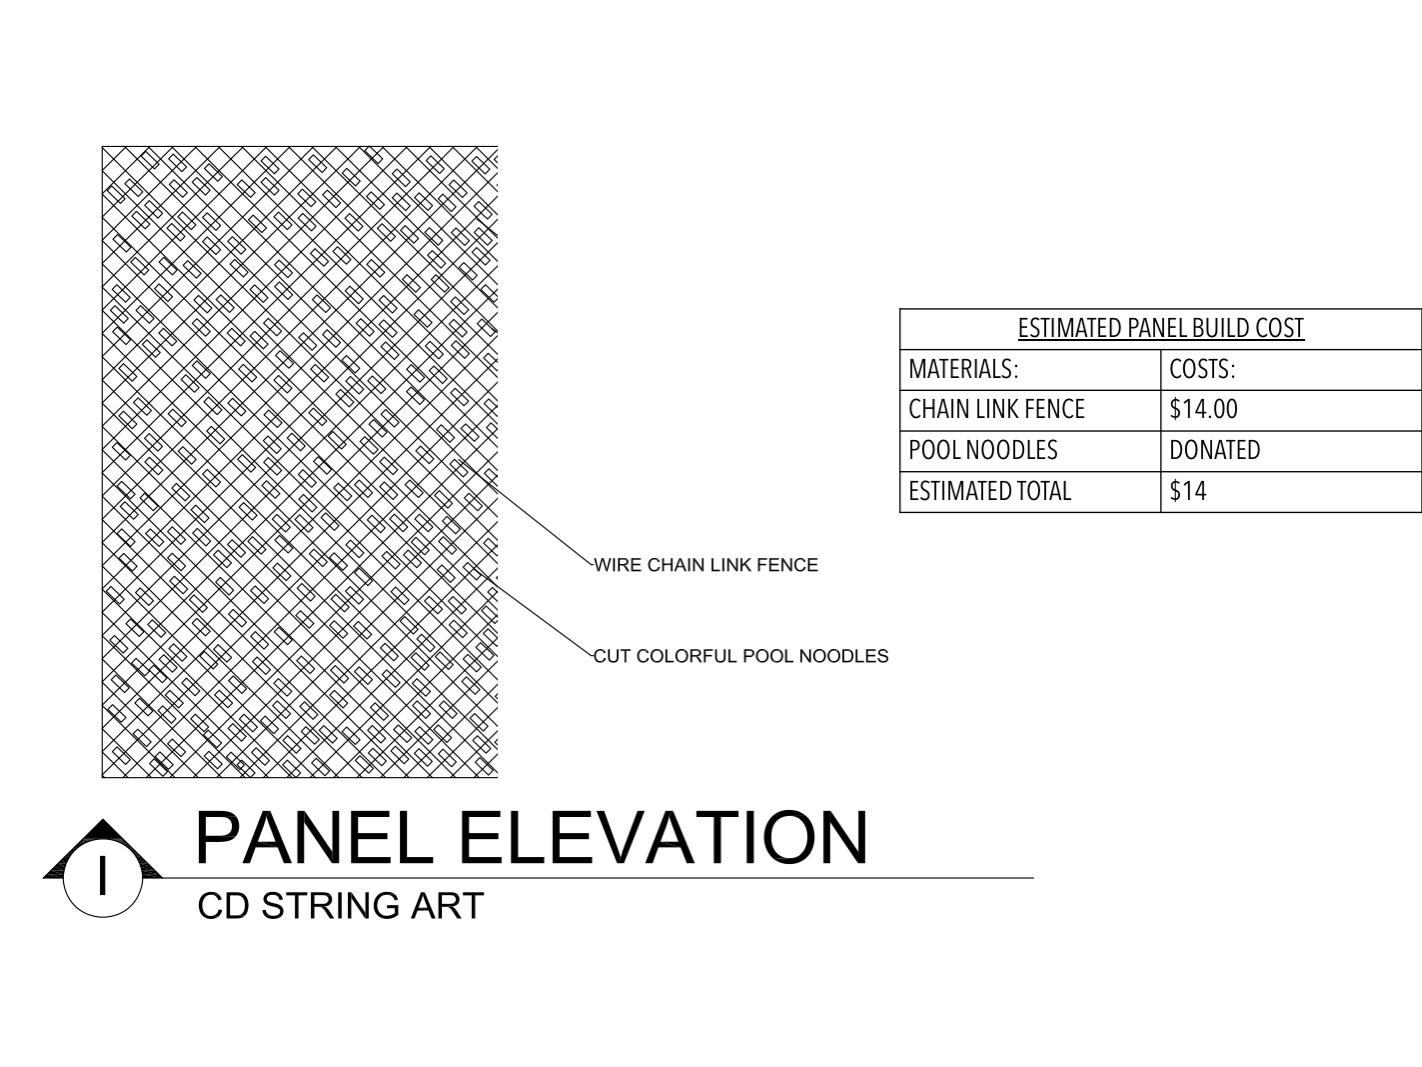 Panel Elevation I